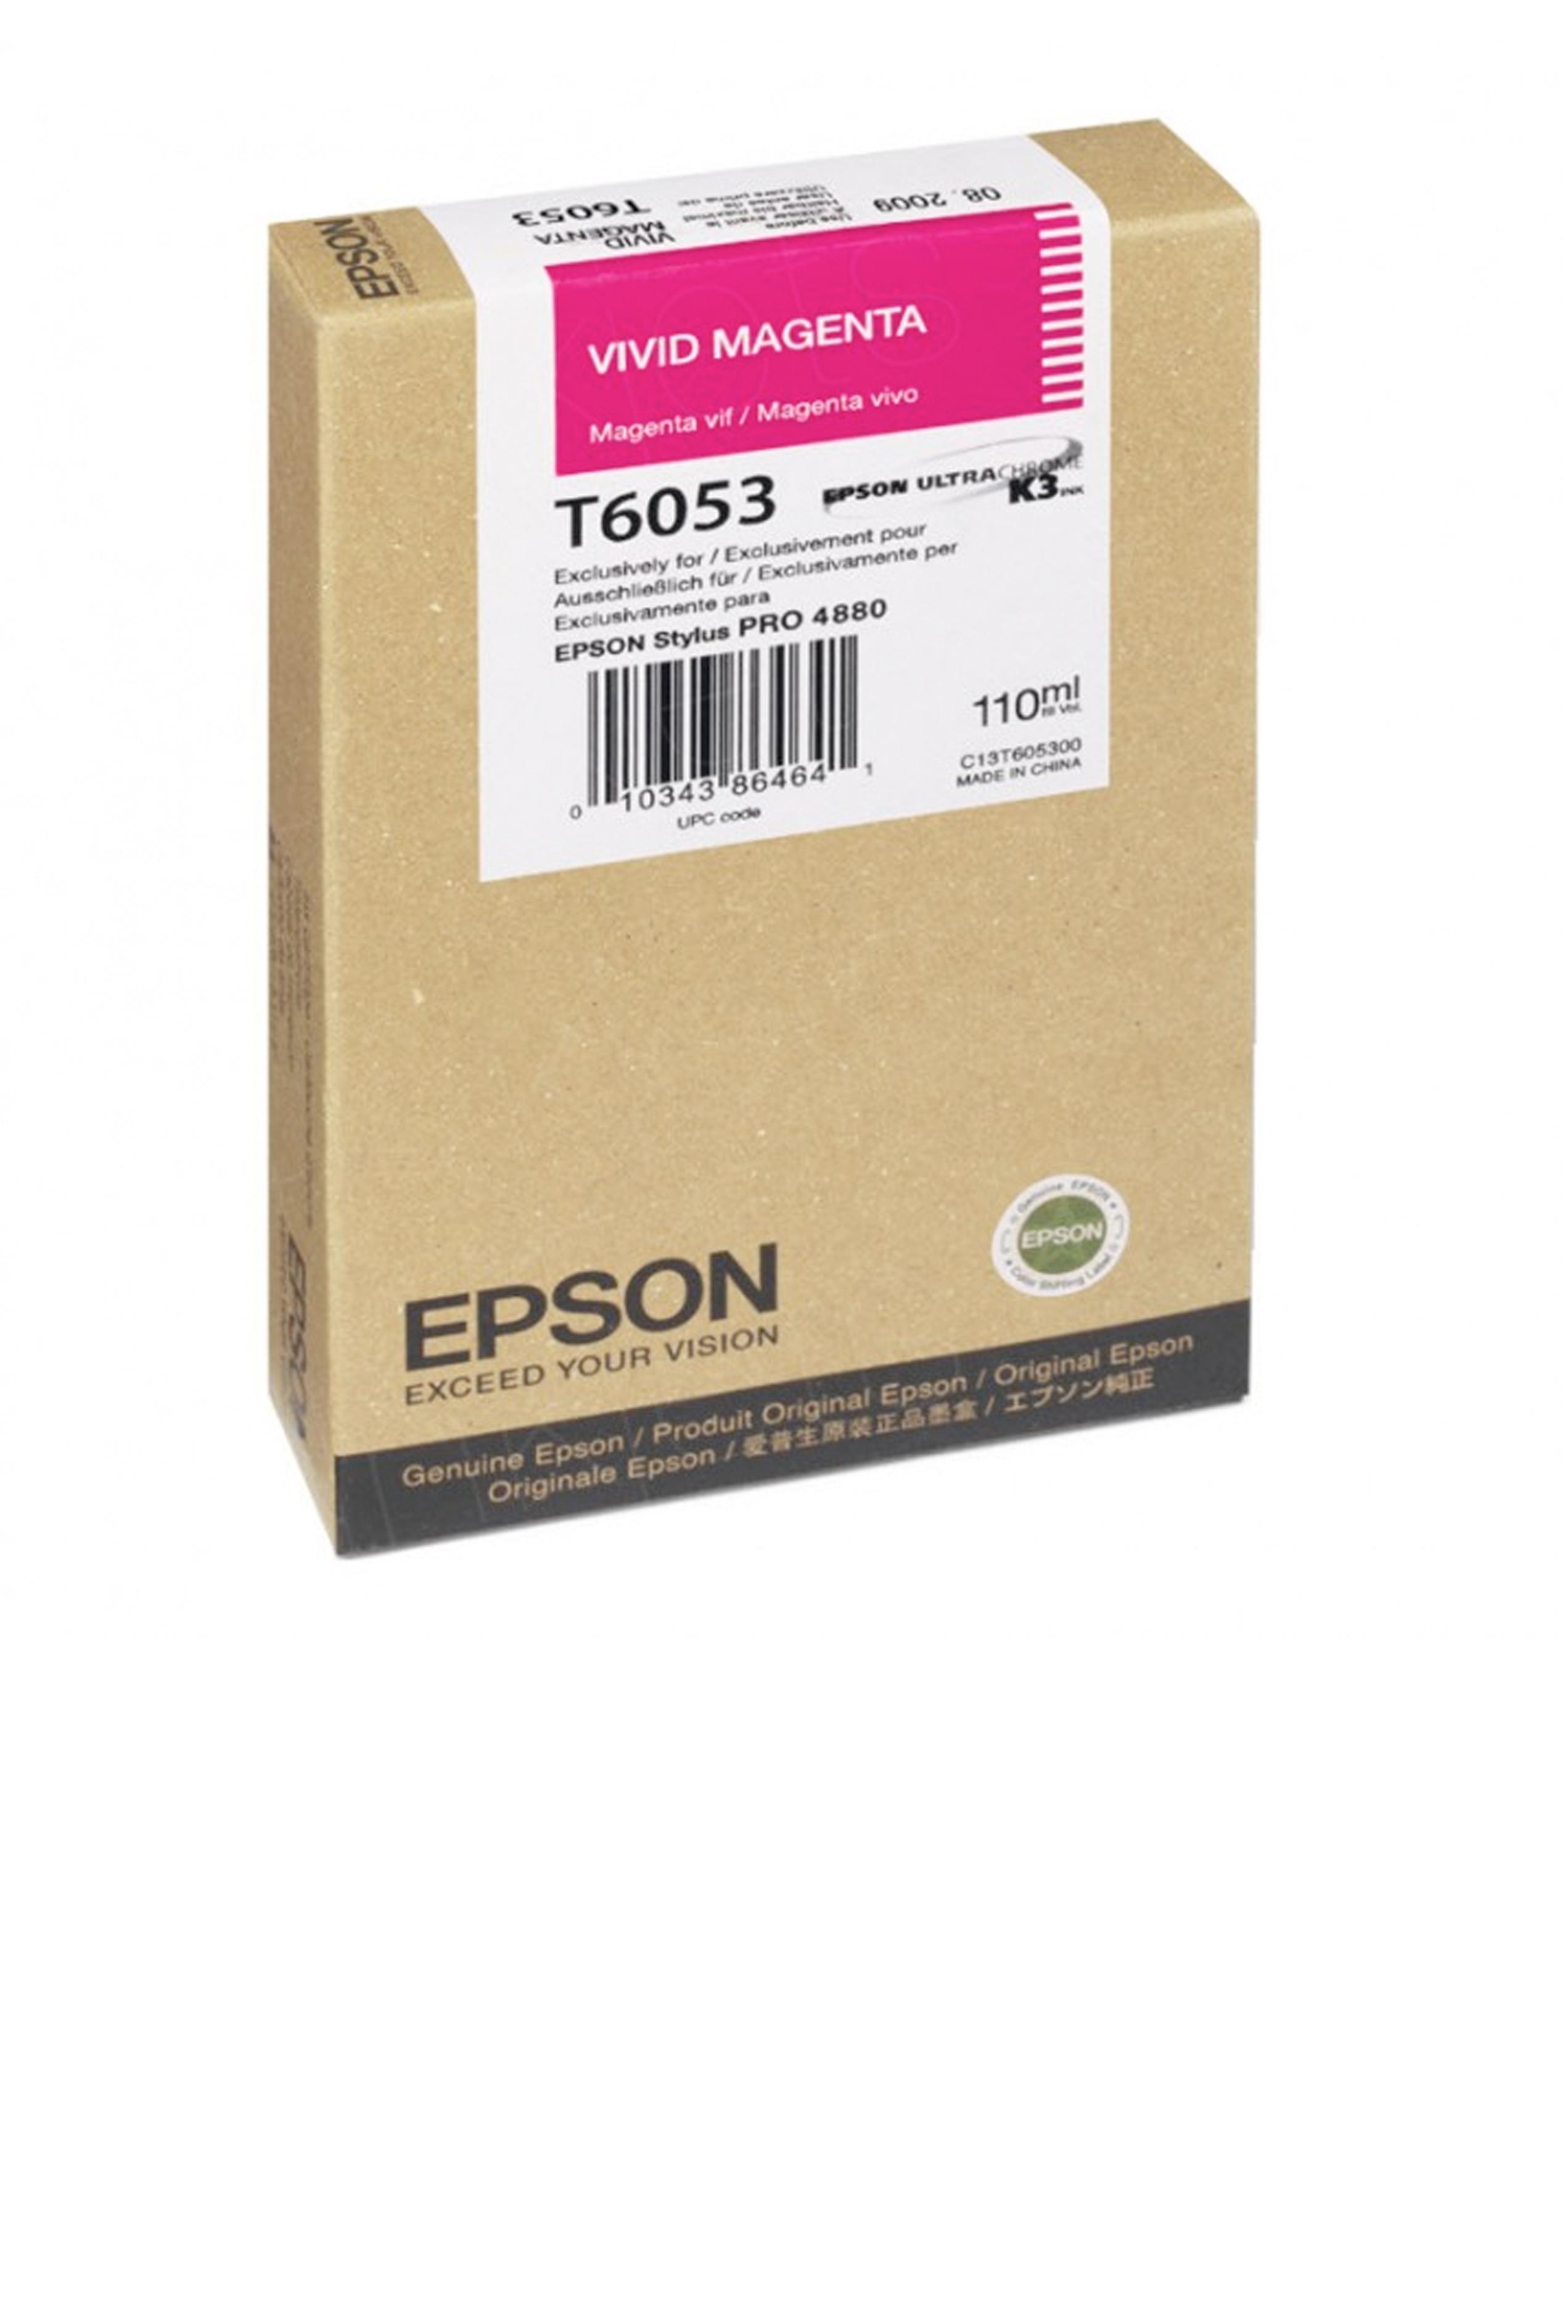 Epson EPSON SD VIVID MAGENTA INK (110 ML) (T605300)